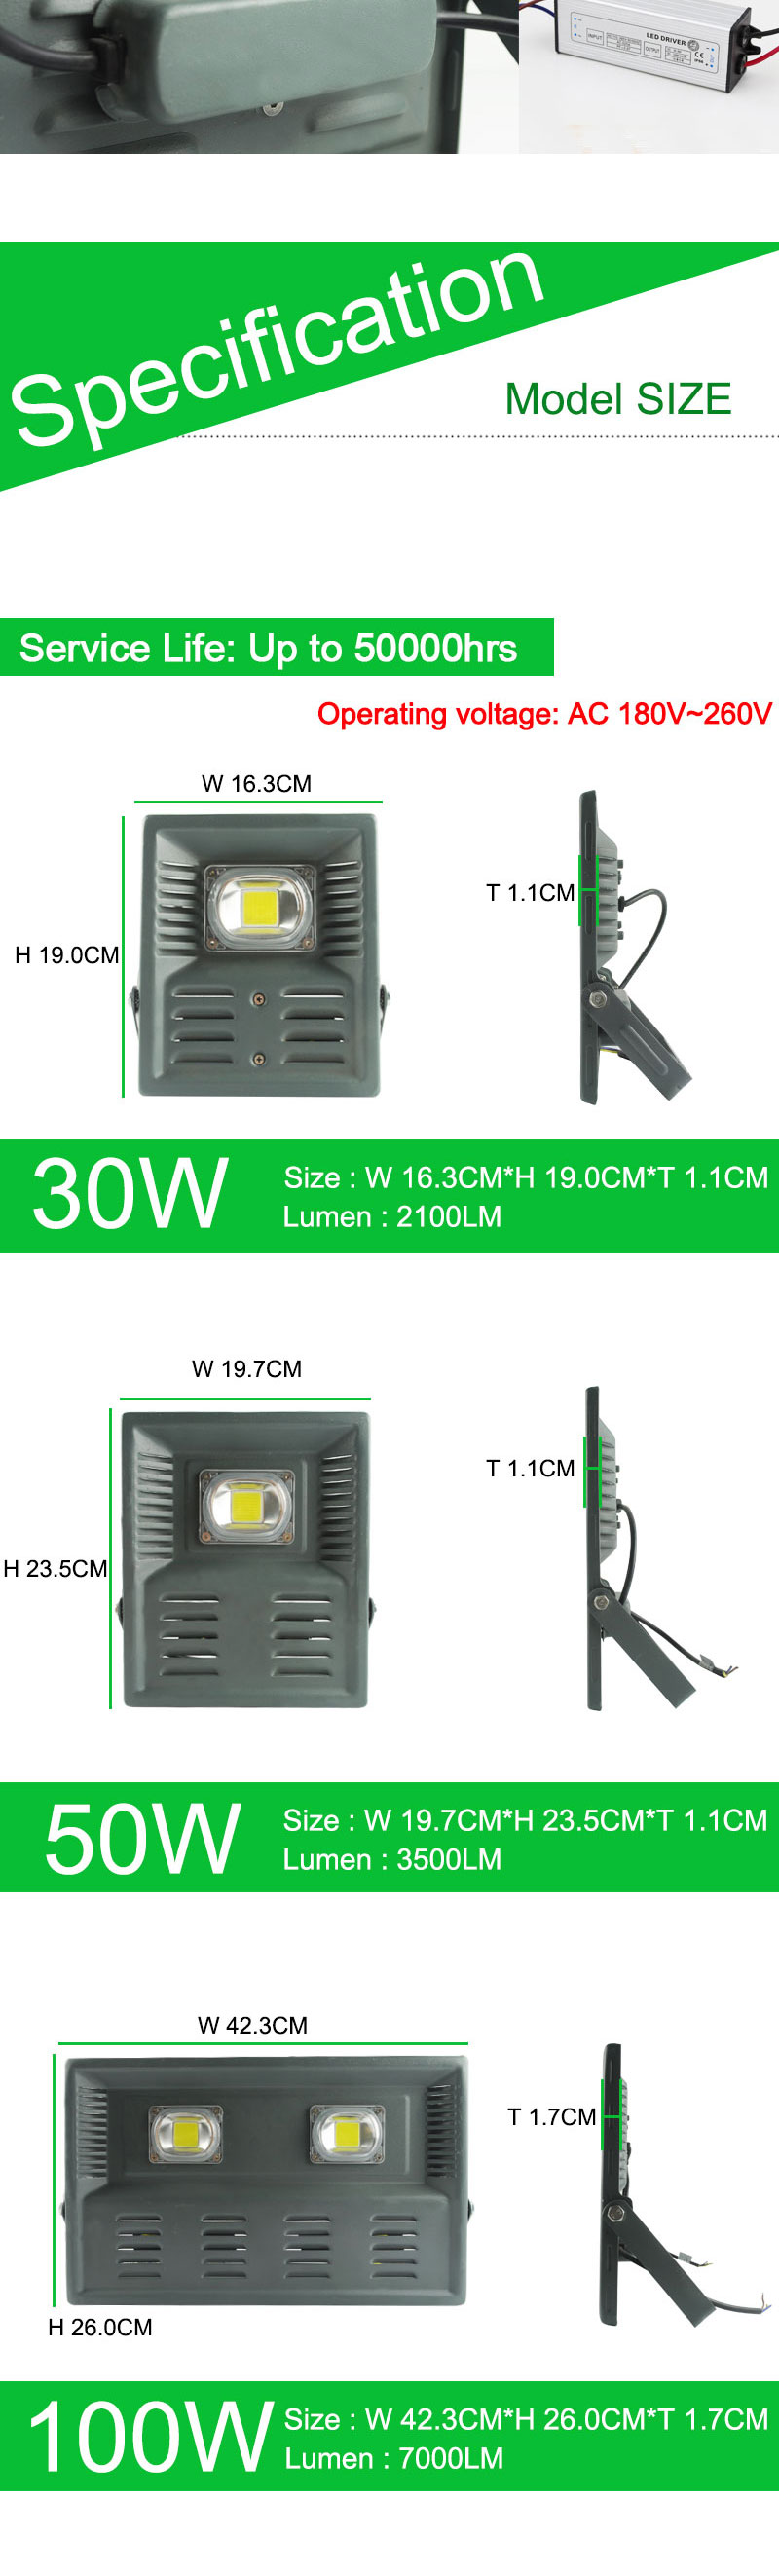 10w 20w 30w 50w Spot Led Flood Light Ac 220v 185 265v Waterproof Ultrasonic Piezoelectric Ceramic Transducer For Humidifier Circuit Ip66 Ip65 Spotlight Outdoor Garden Lamp Floodlight Lighting